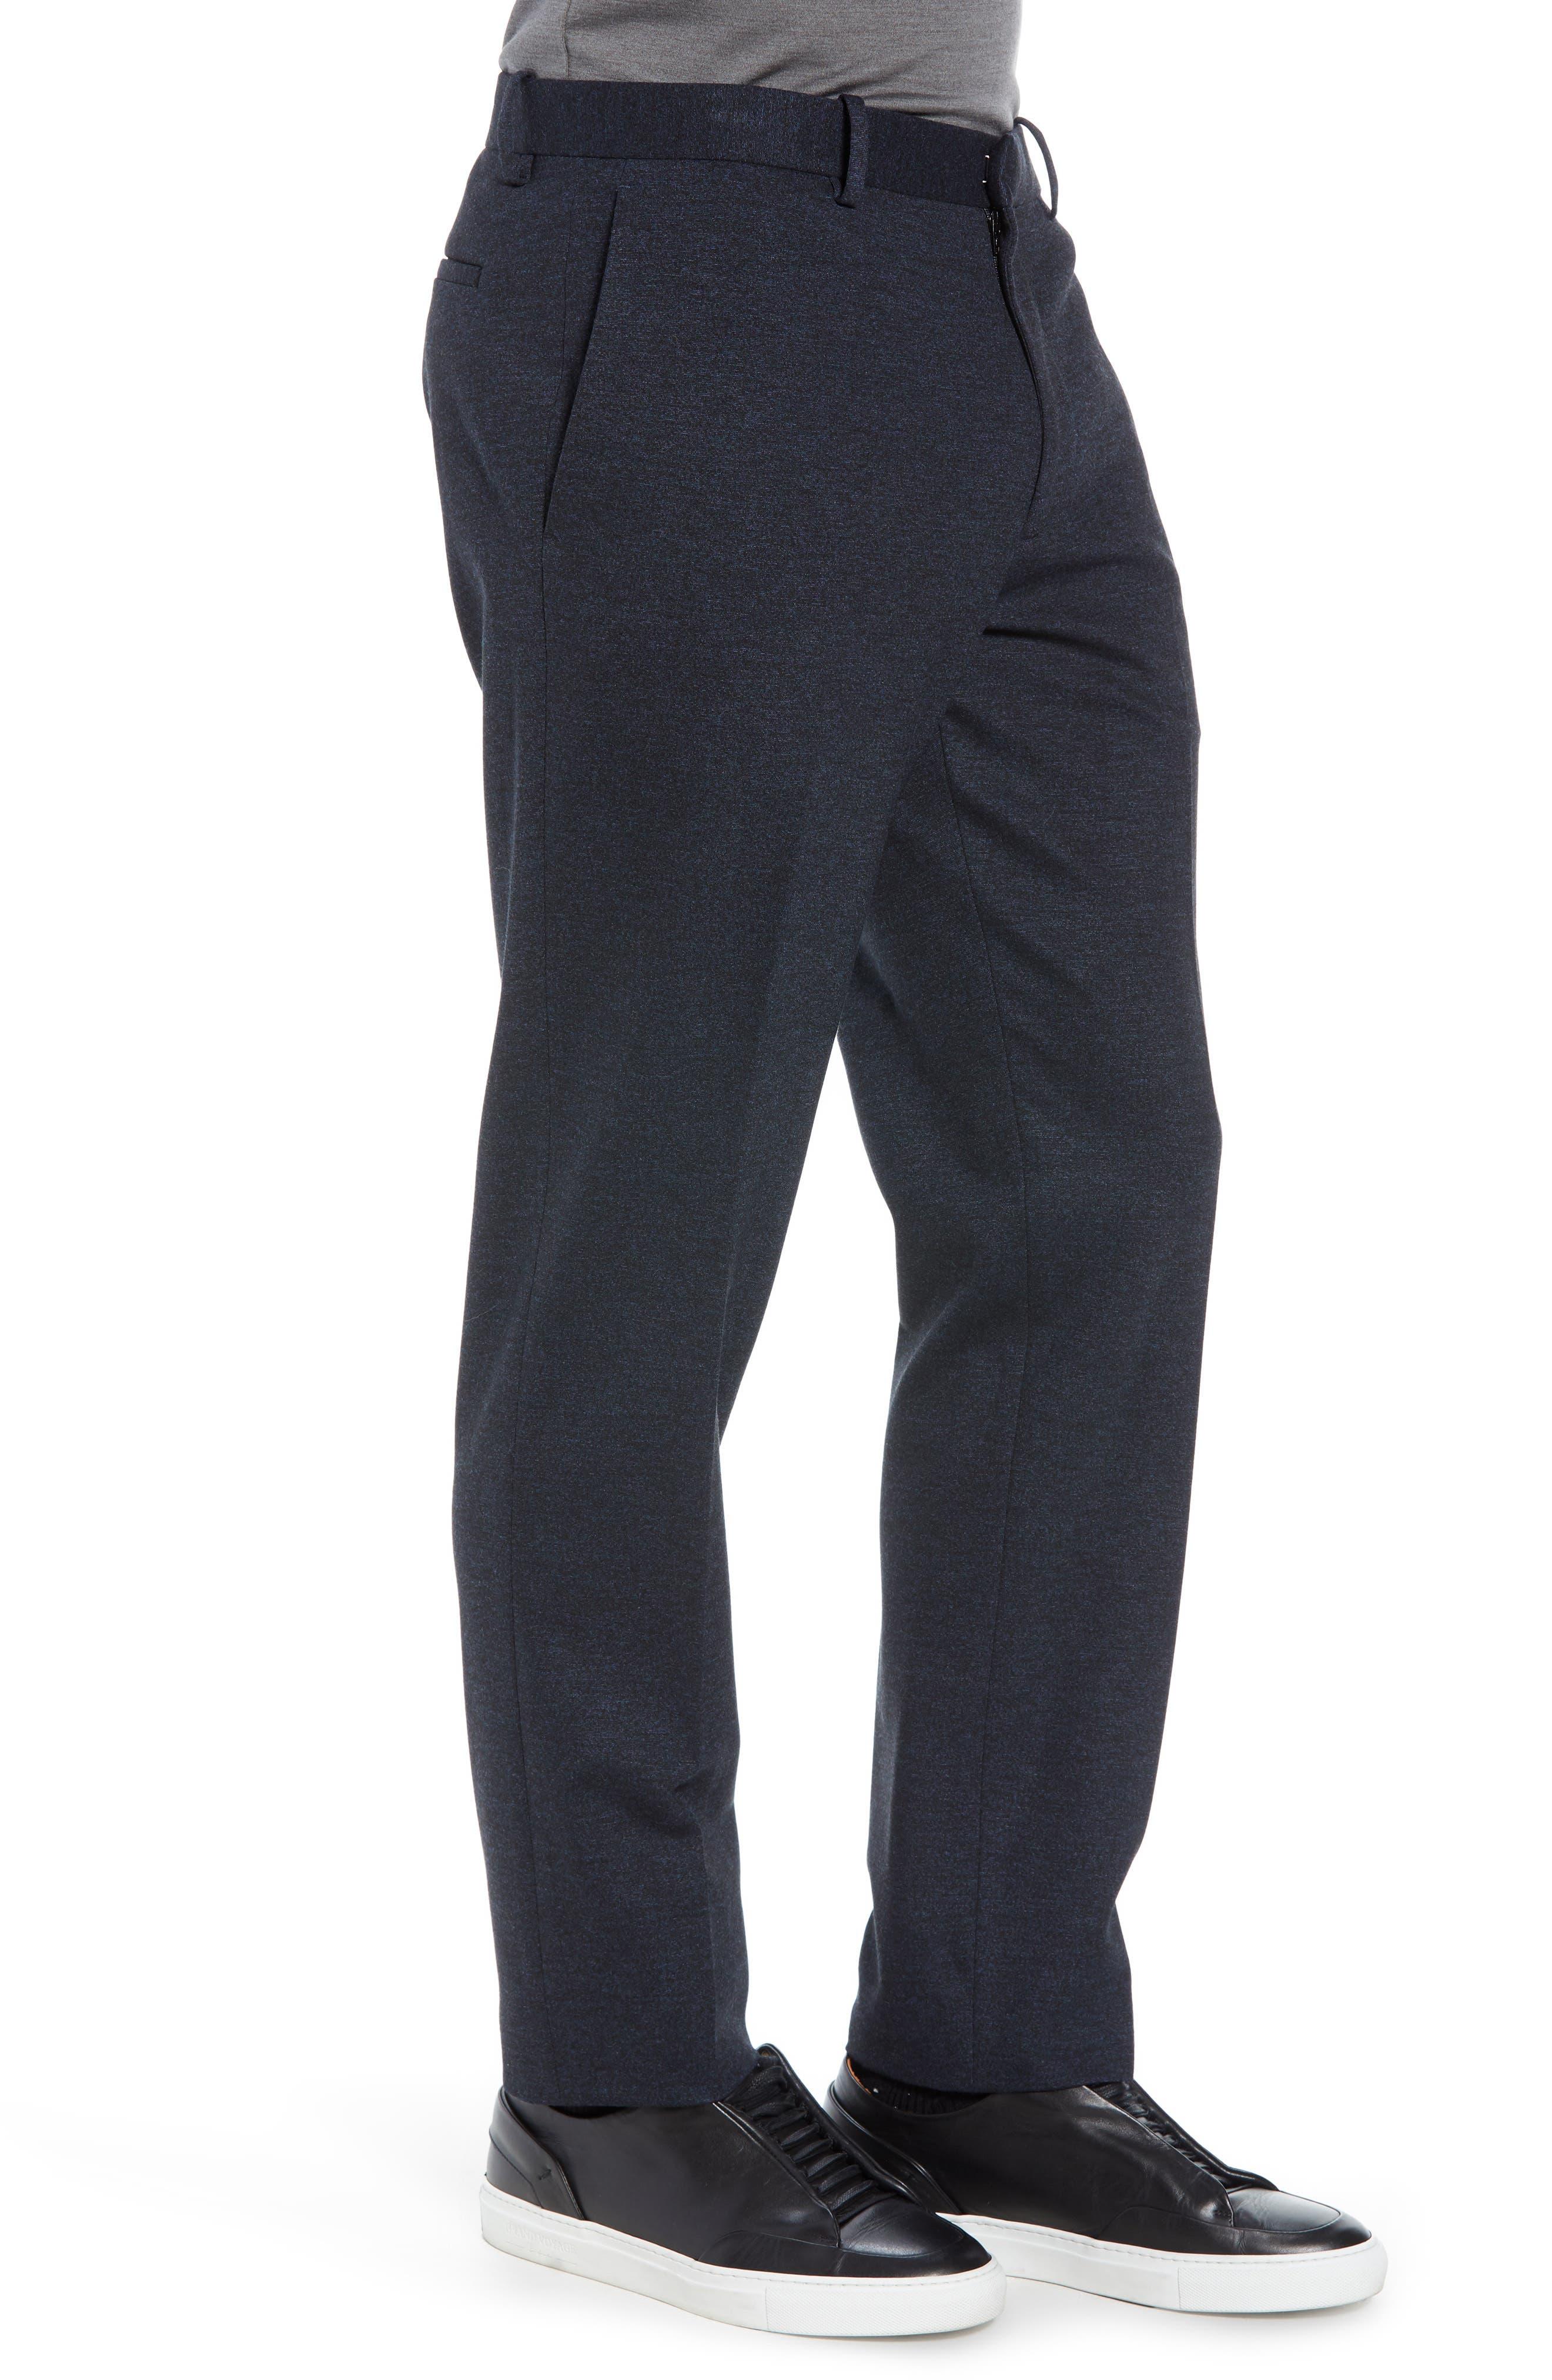 Payton Marled Ponte Trousers,                             Alternate thumbnail 3, color,                             ECLIPSE MELANGE